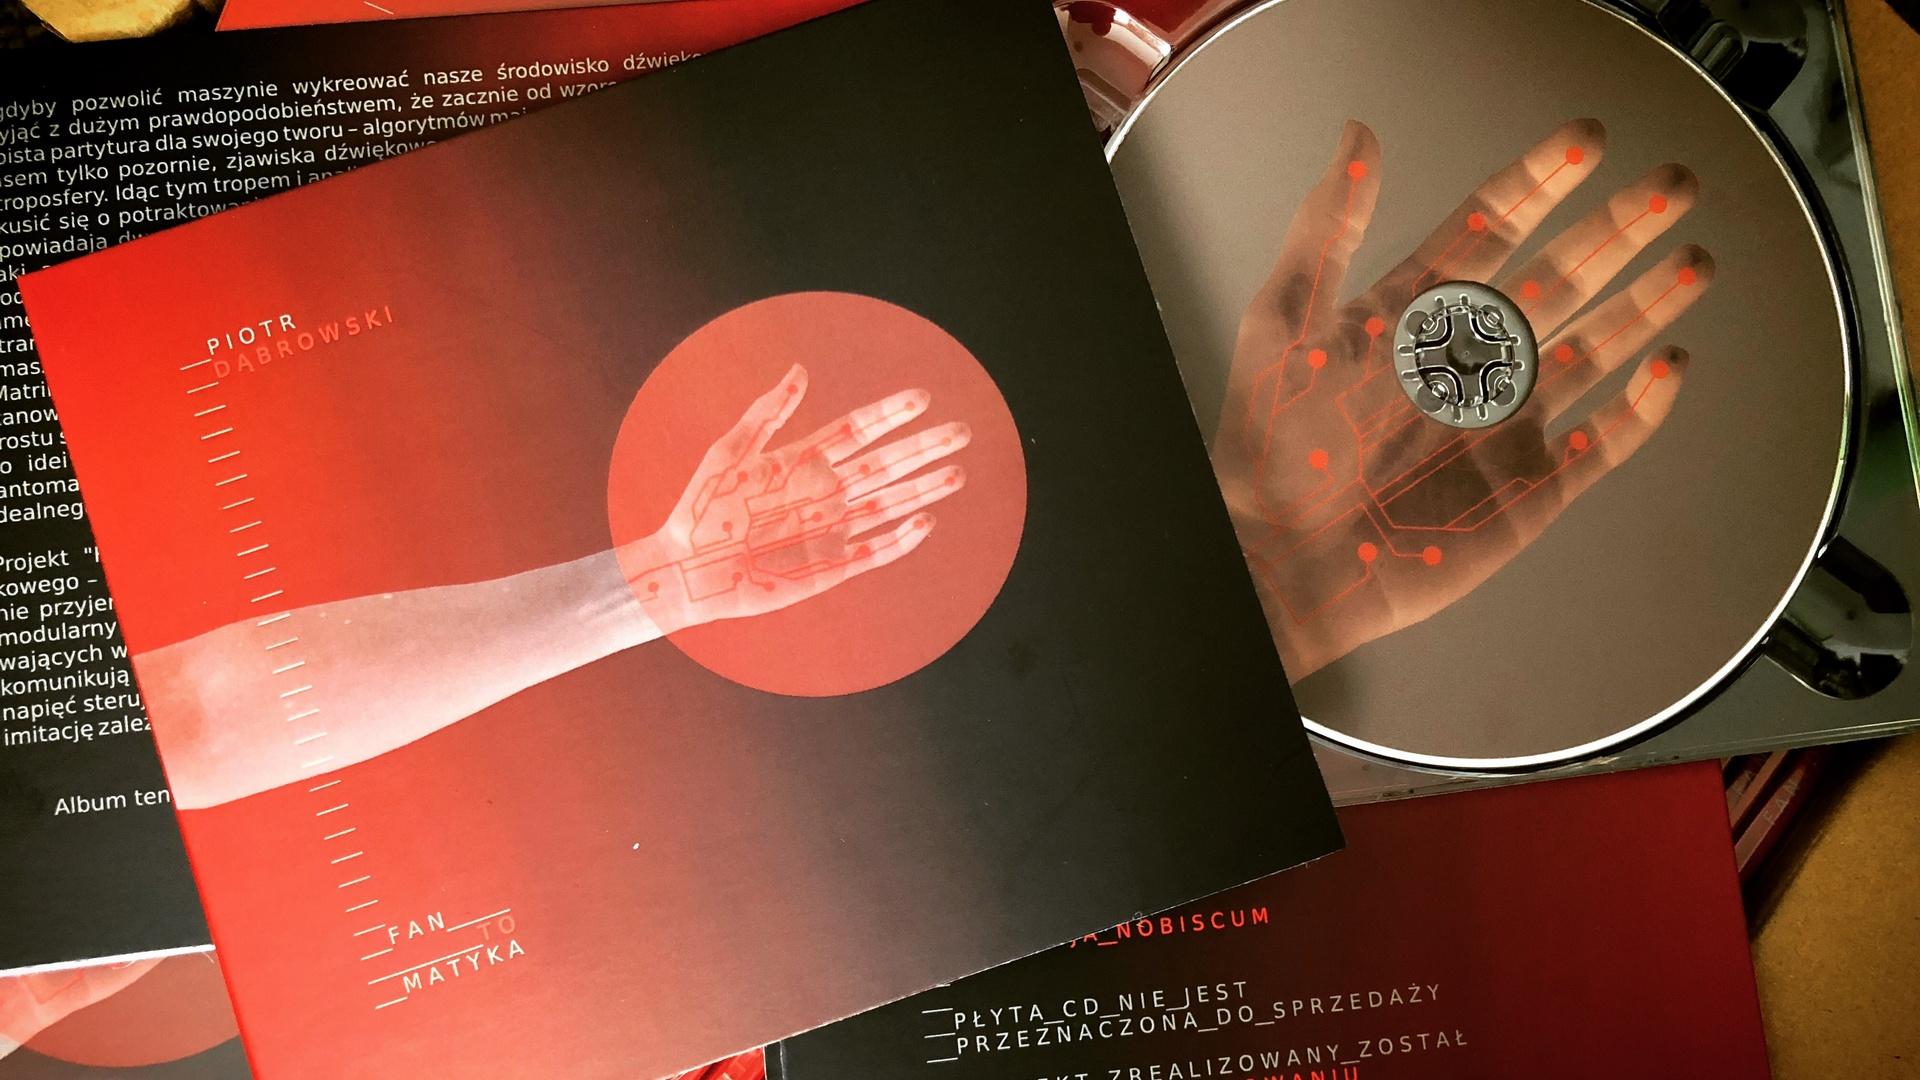 Fantomatyka – premiera online 30 lipca, CD już niebawem!